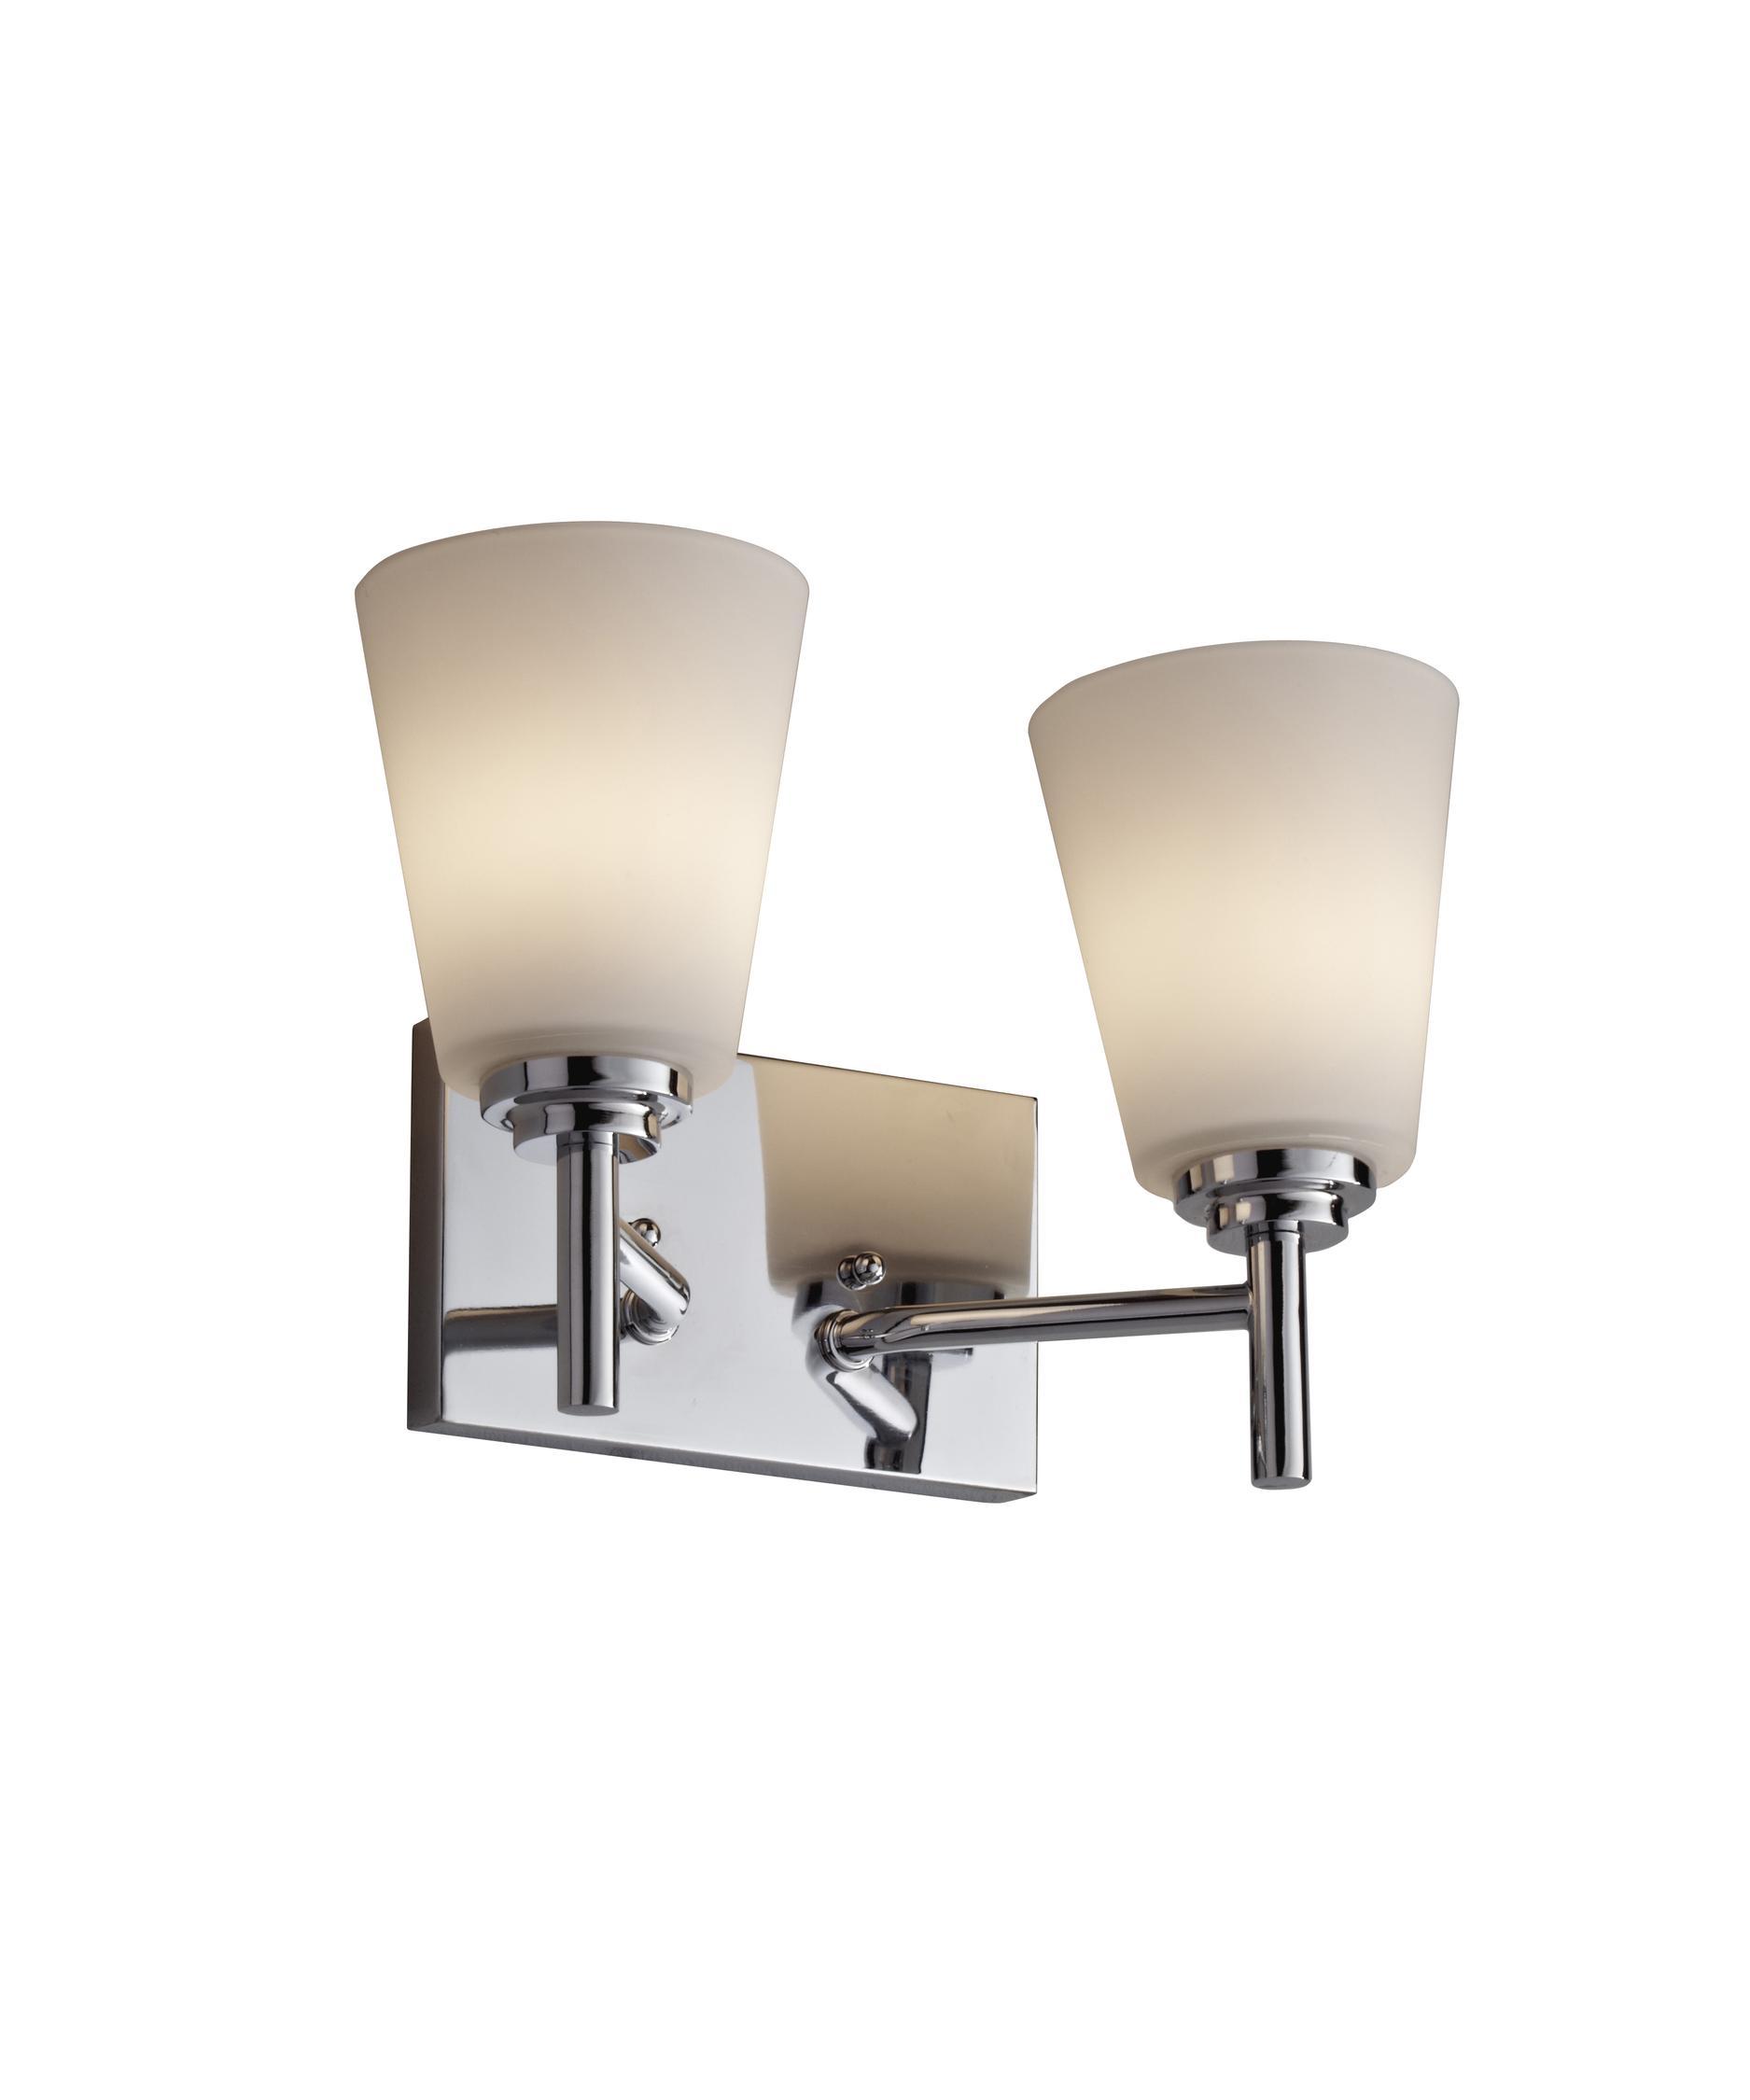 murray feiss regan bath vanity light capitol lighting 1 800lighting. Black Bedroom Furniture Sets. Home Design Ideas